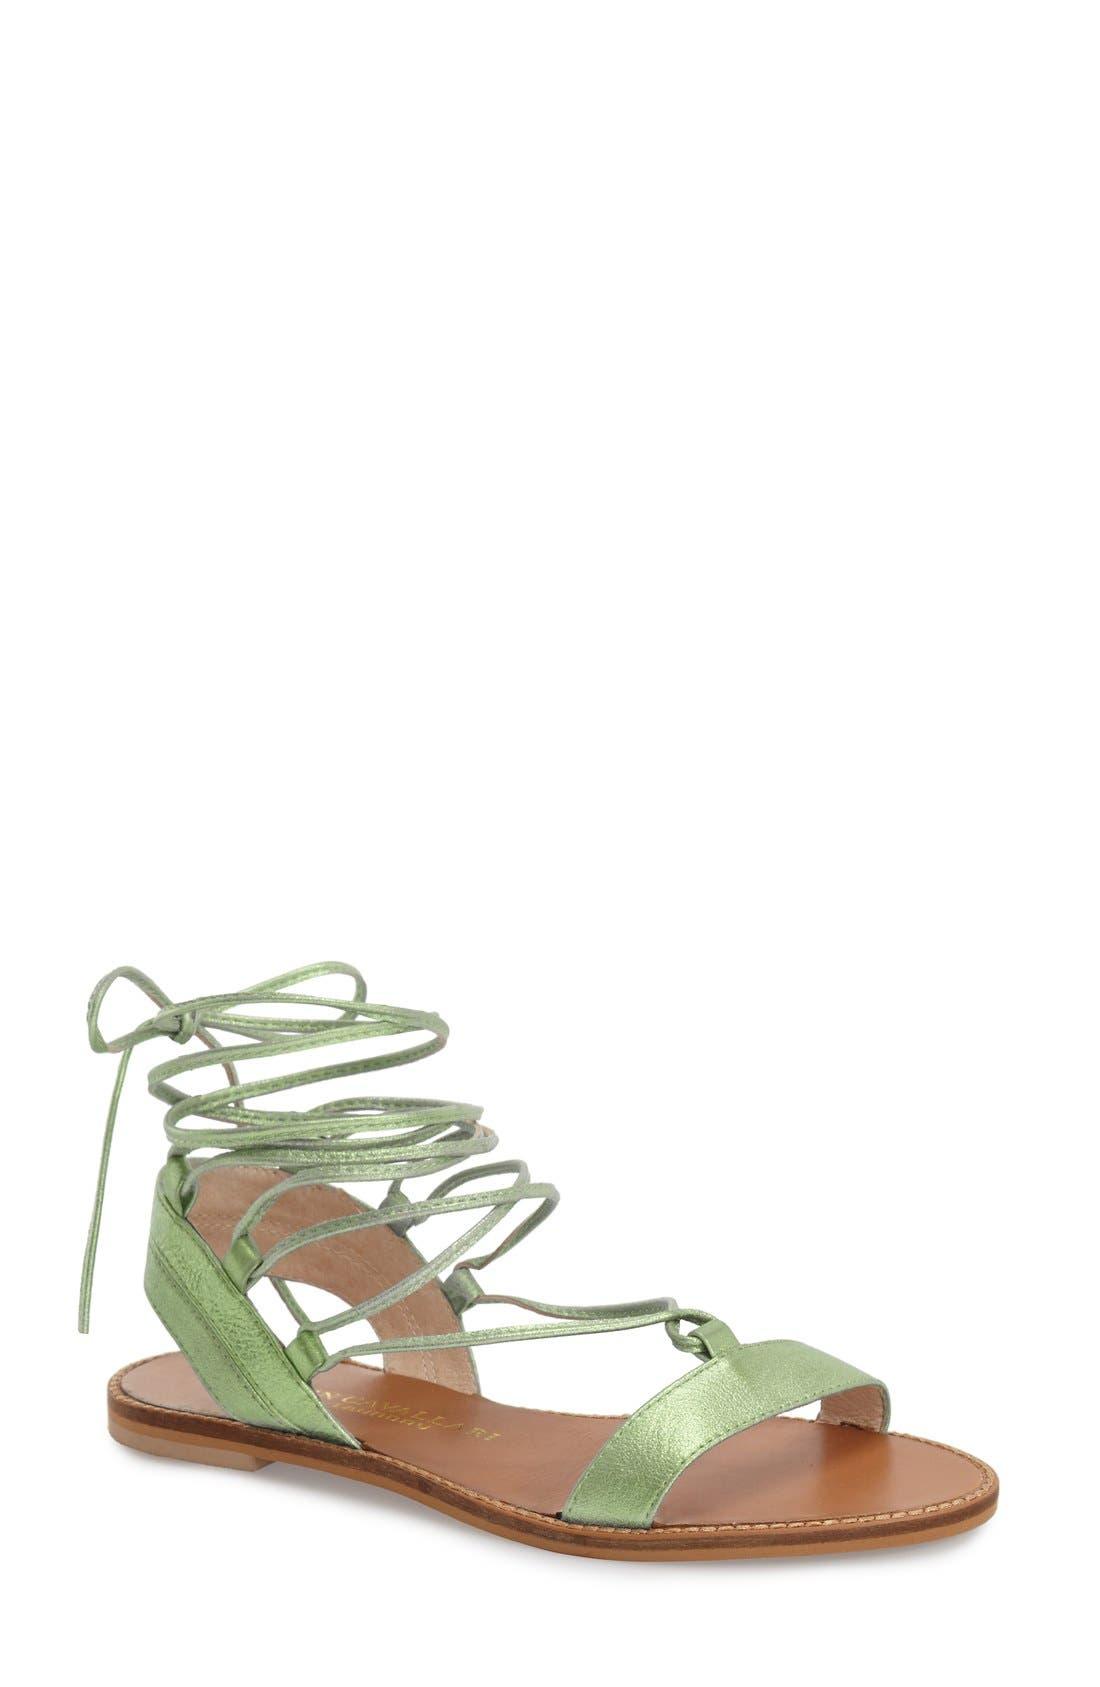 Alternate Image 1 Selected - Kristin Cavallari 'Belle' Lace-Up Sandal (Women)